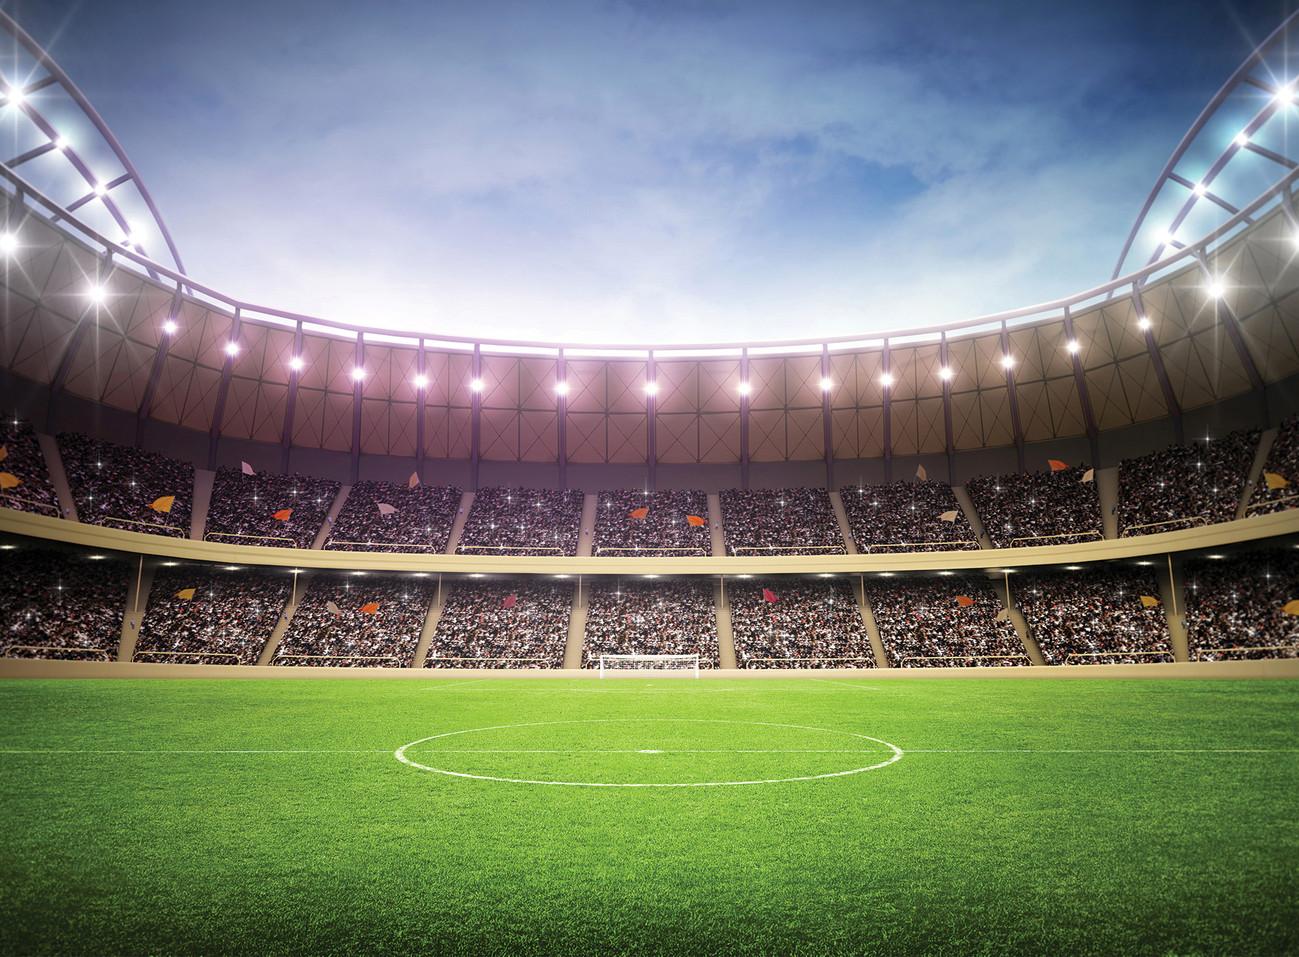 Football Stadium Wall Mural Buy at EuroPosters